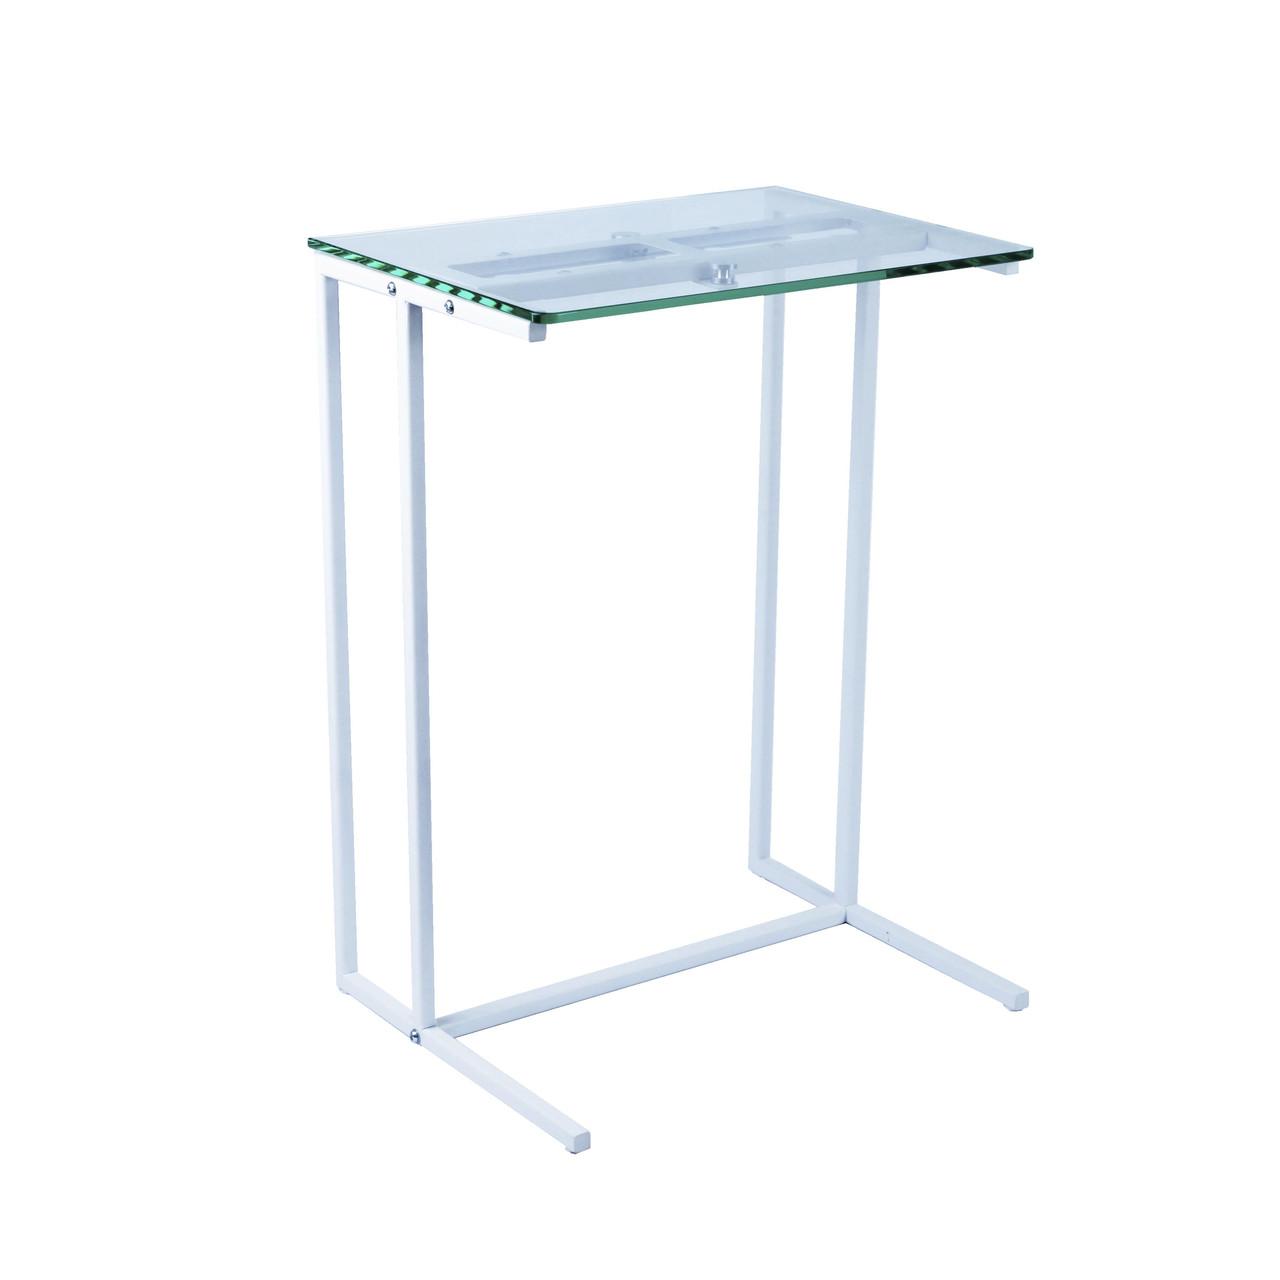 Стол приставной для предметов комфорта и IT-техники Commus Comfort A440 clear 8 /white